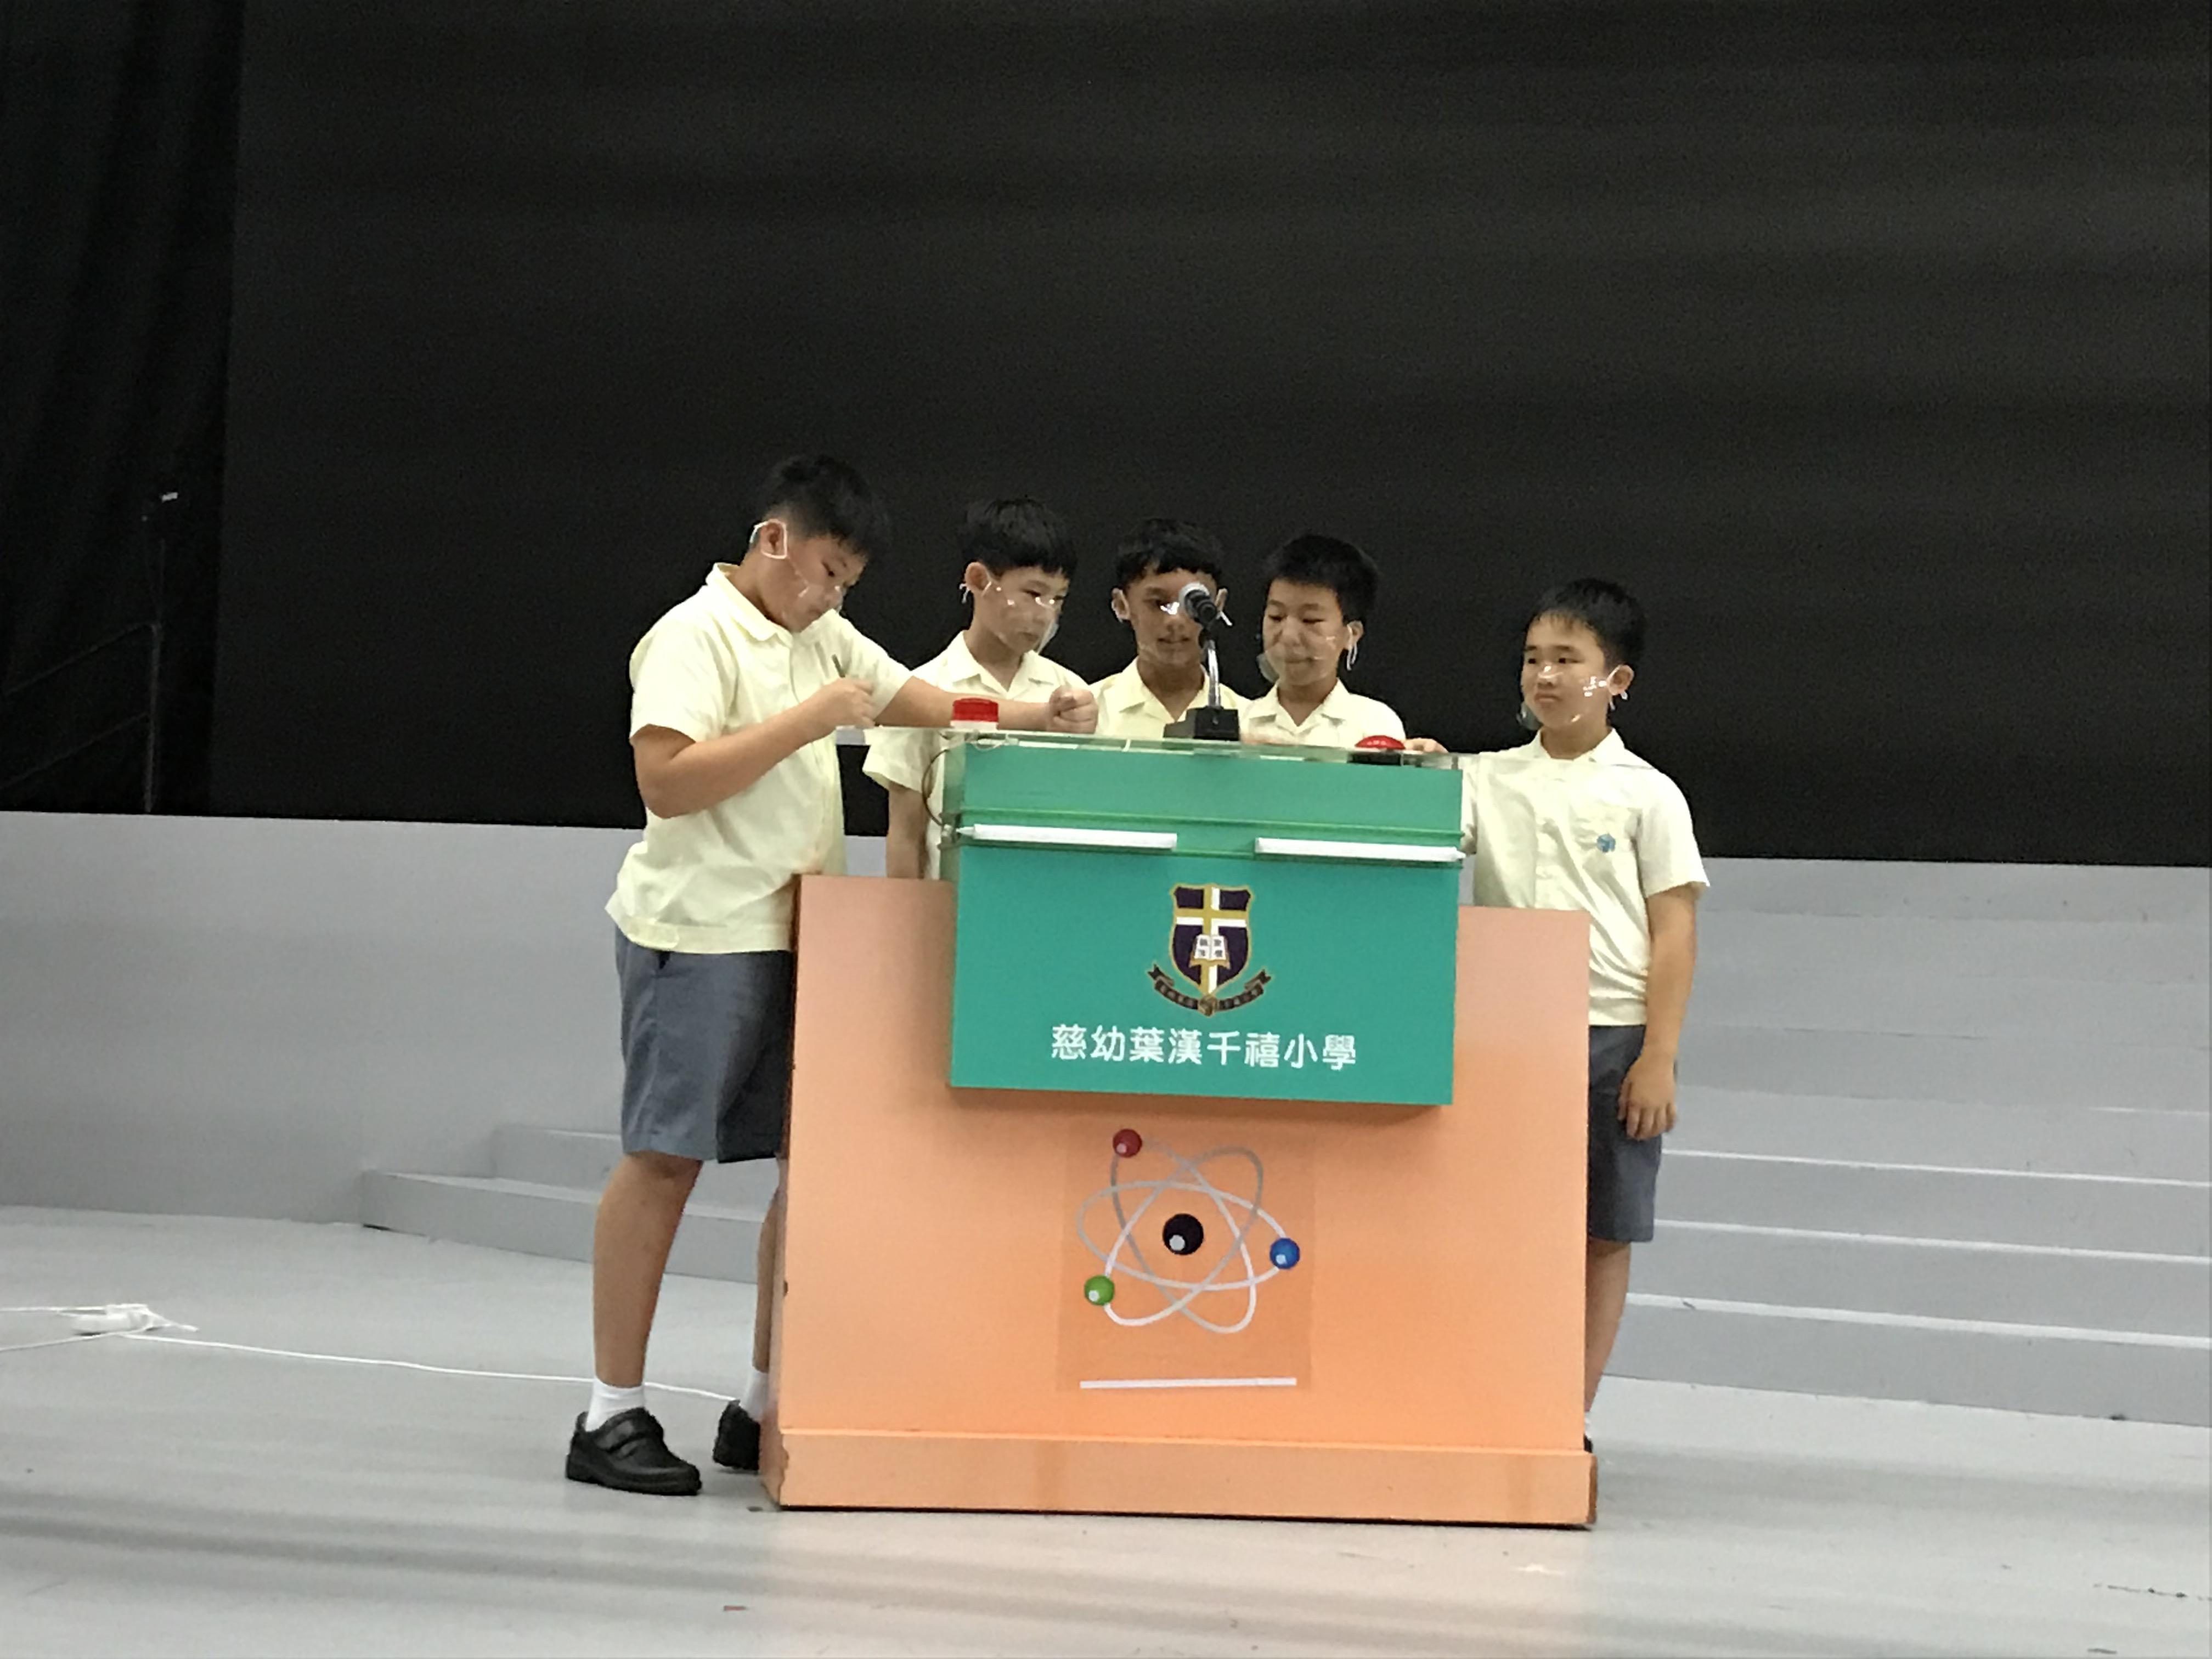 https://syh.edu.hk/sites/default/files/img-7565.jpg